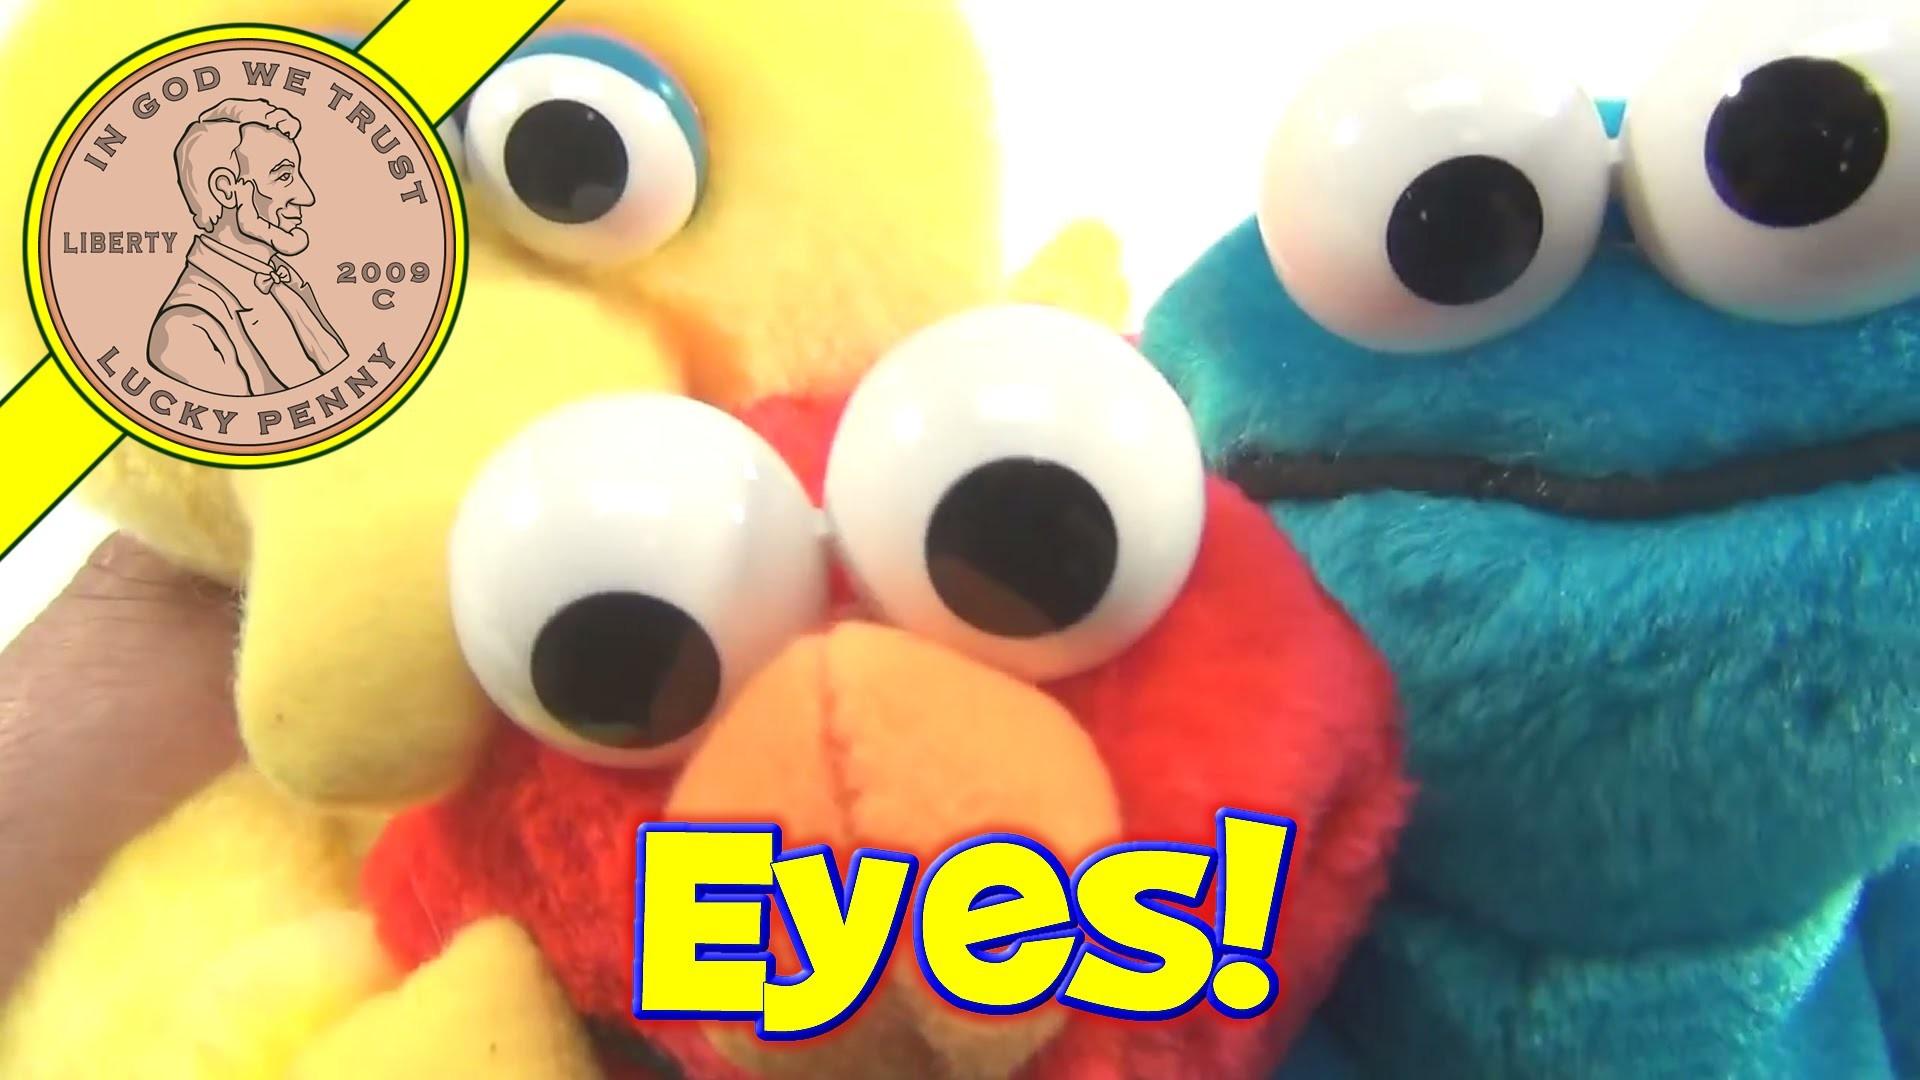 Res: 1920x1080, Sesame Street Big Bird, Cookie Monster and Elmo Plush Dolls, 1995 Tyco Toys  - YouTube